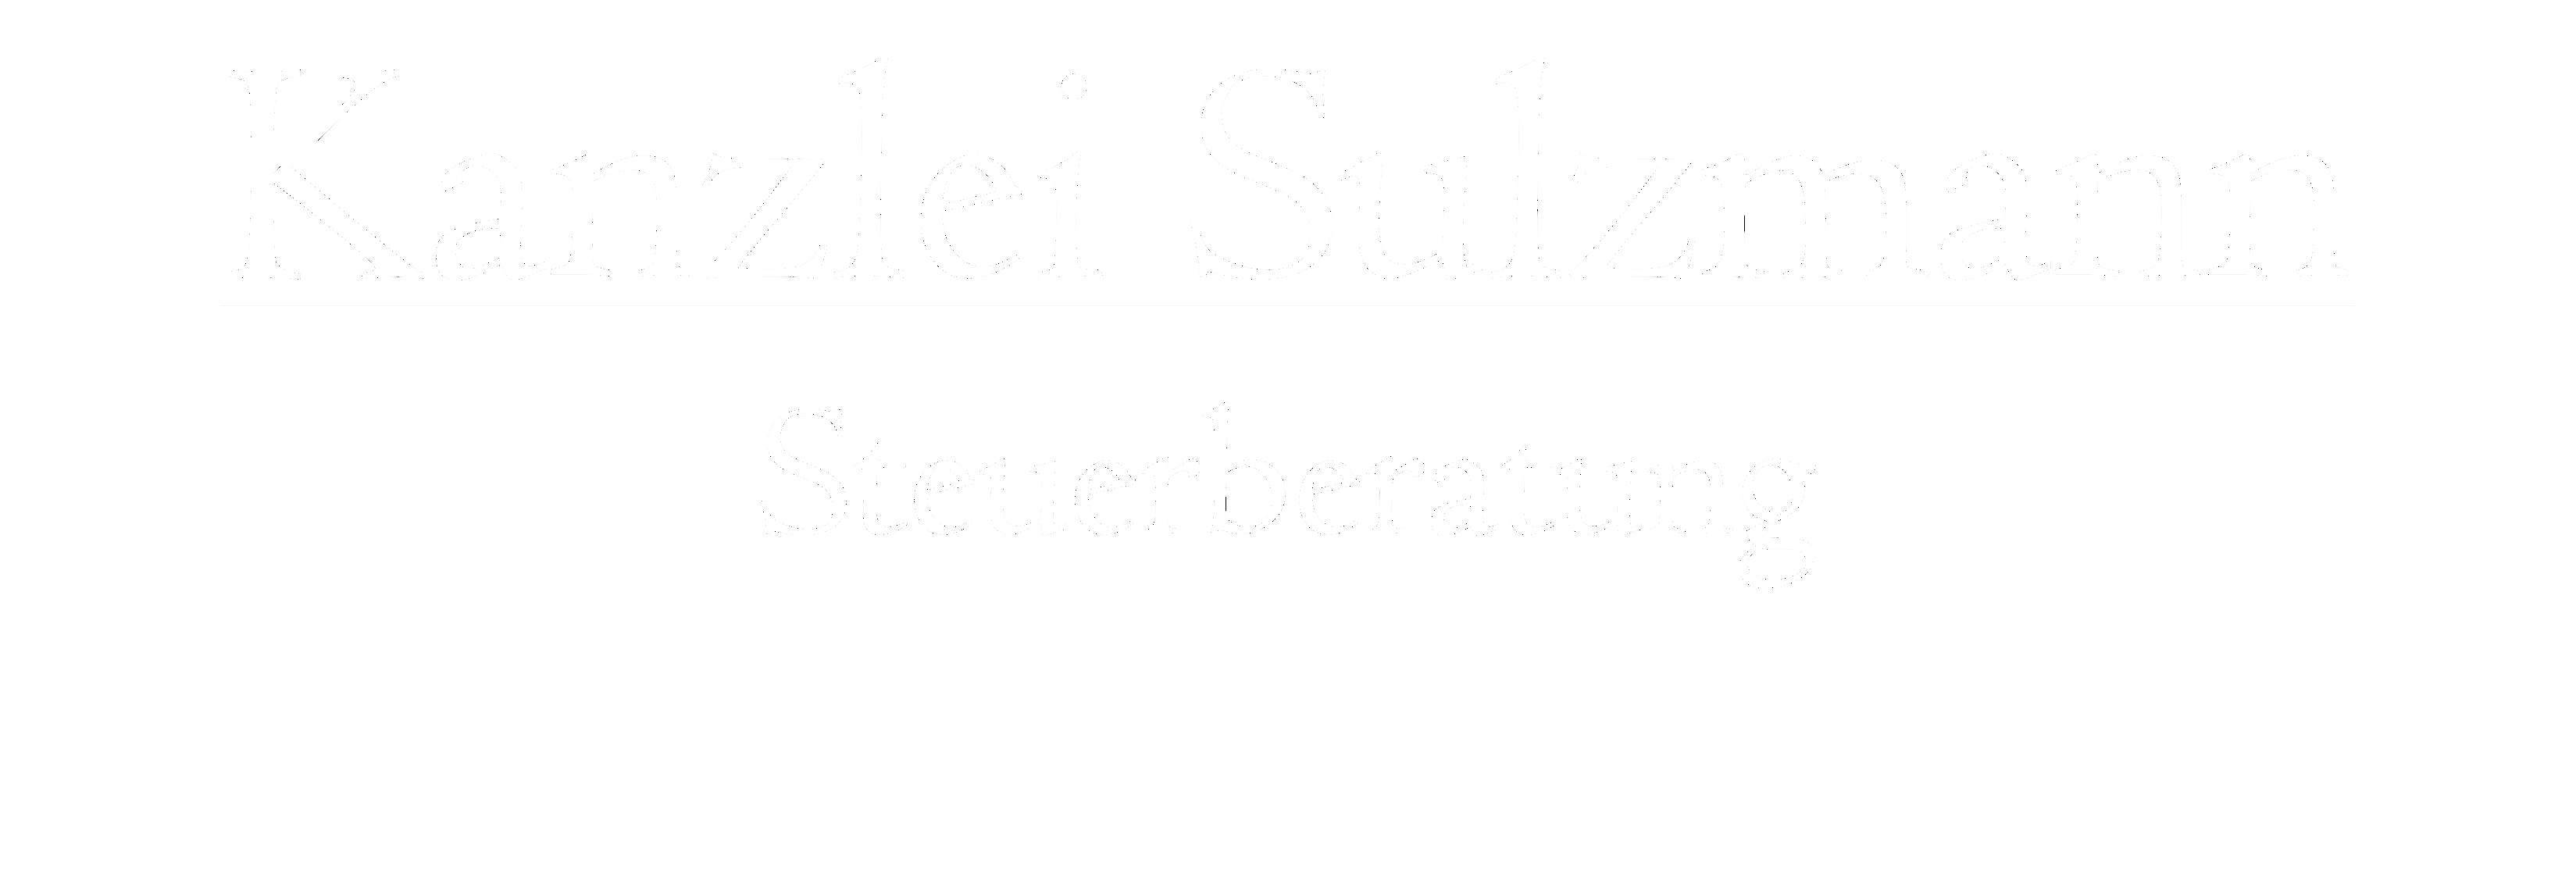 Kanzlei Sulzmann